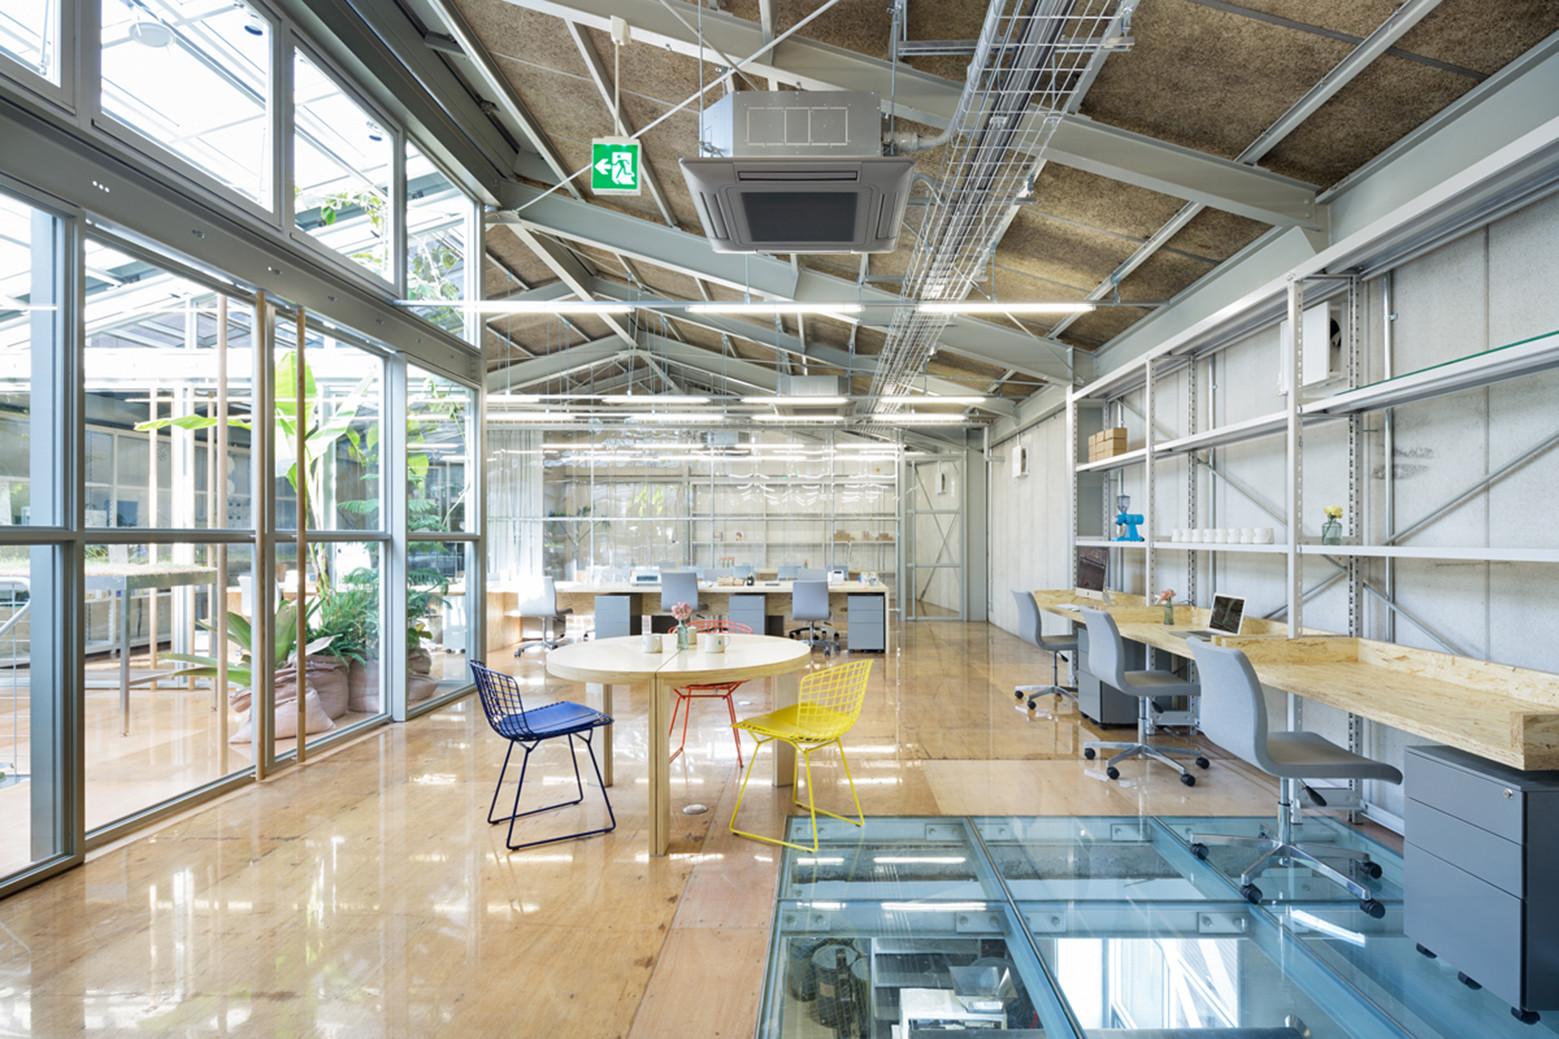 Blue Bottle Coffee Kiyosumi-Shirakawa Roastery & Cafe / Schemata Architects, © Takumi Ota